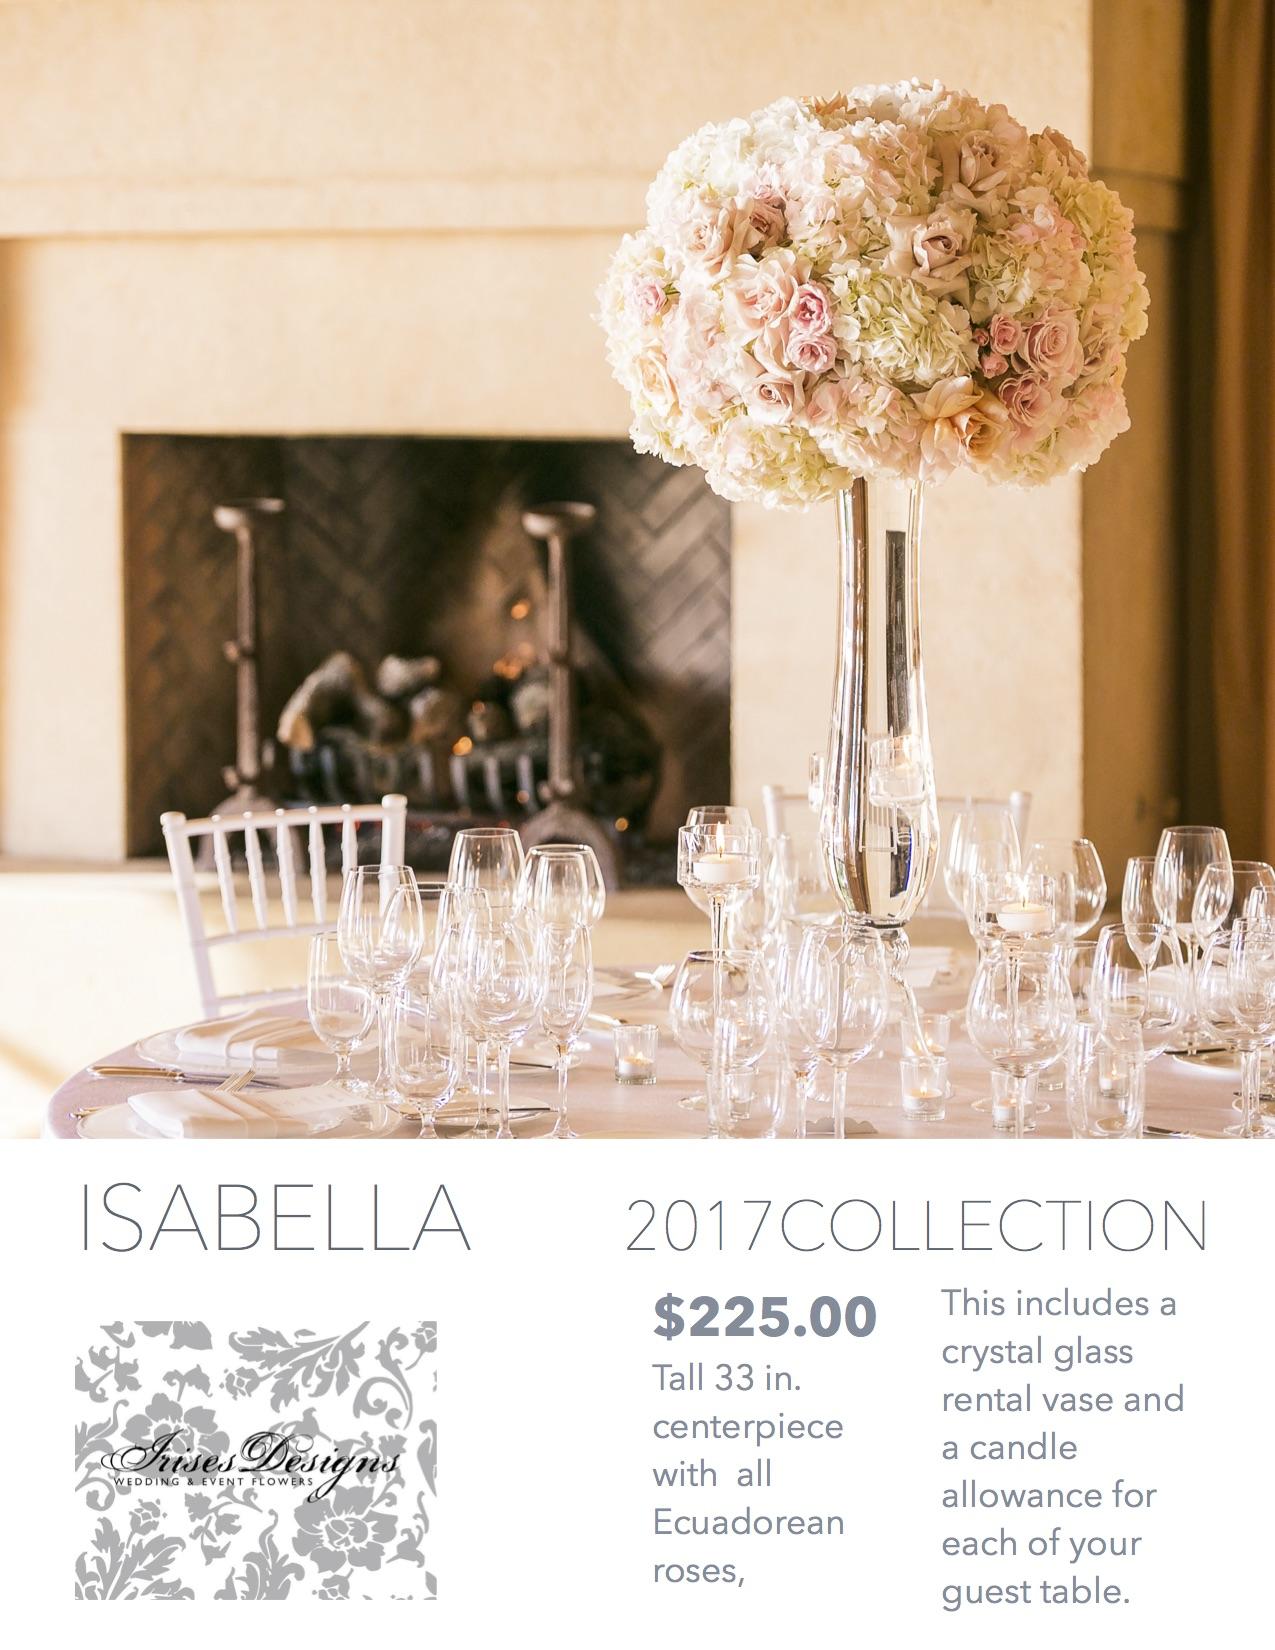 2017 Isabella.jpg